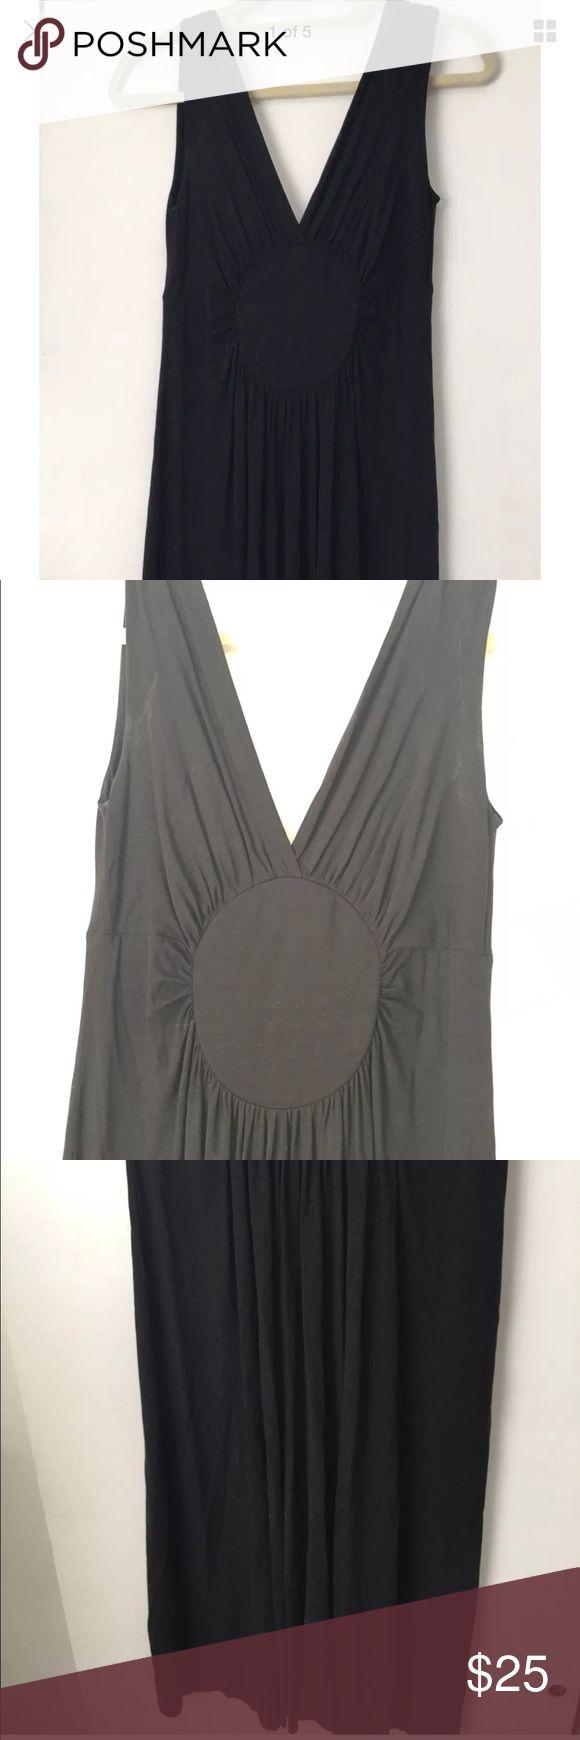 Tufi Duek Black  V Neck Stretch Dress Size Medium Tufi Duek Black  V Neck Stretch Dress Size Medium tufi duek Dresses